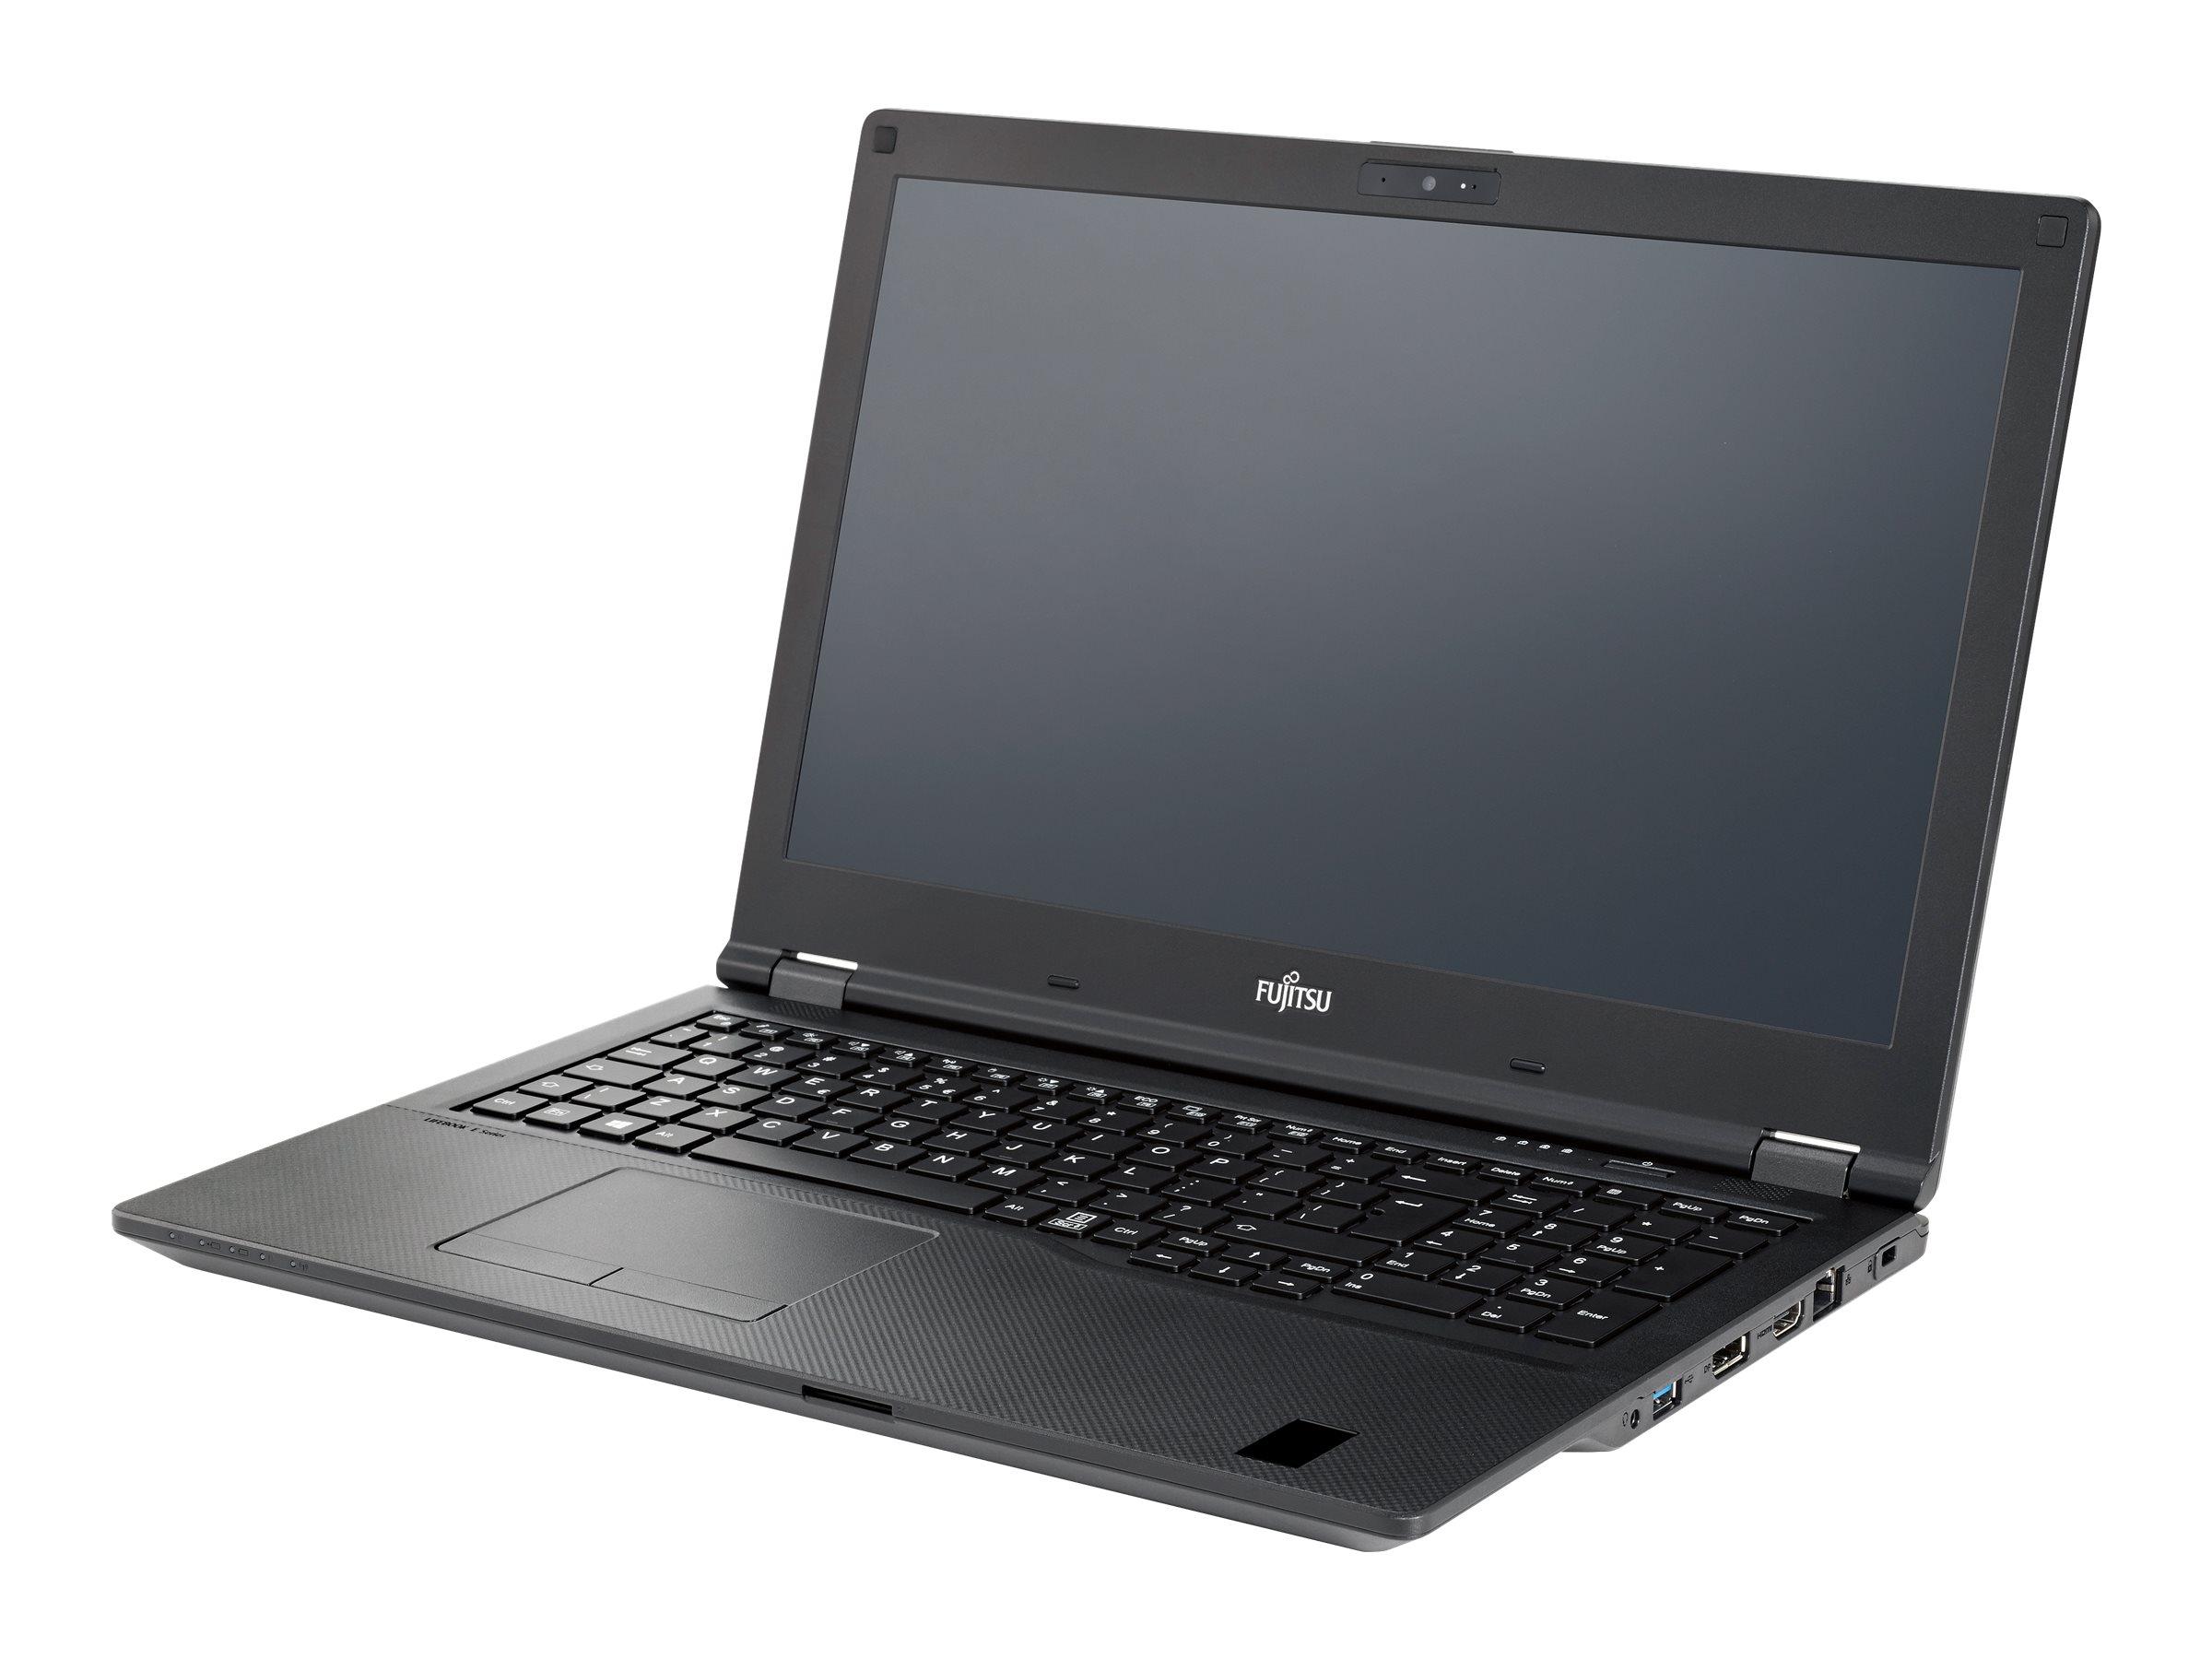 "Fujitsu LIFEBOOK E5510 - Core i5 10210U / 1.6 GHz - Win 10 Pro - 16 GB RAM - 512 GB SSD SED, TCG Opal Encryption, NVMe - 39.6 cm (15.6"")"